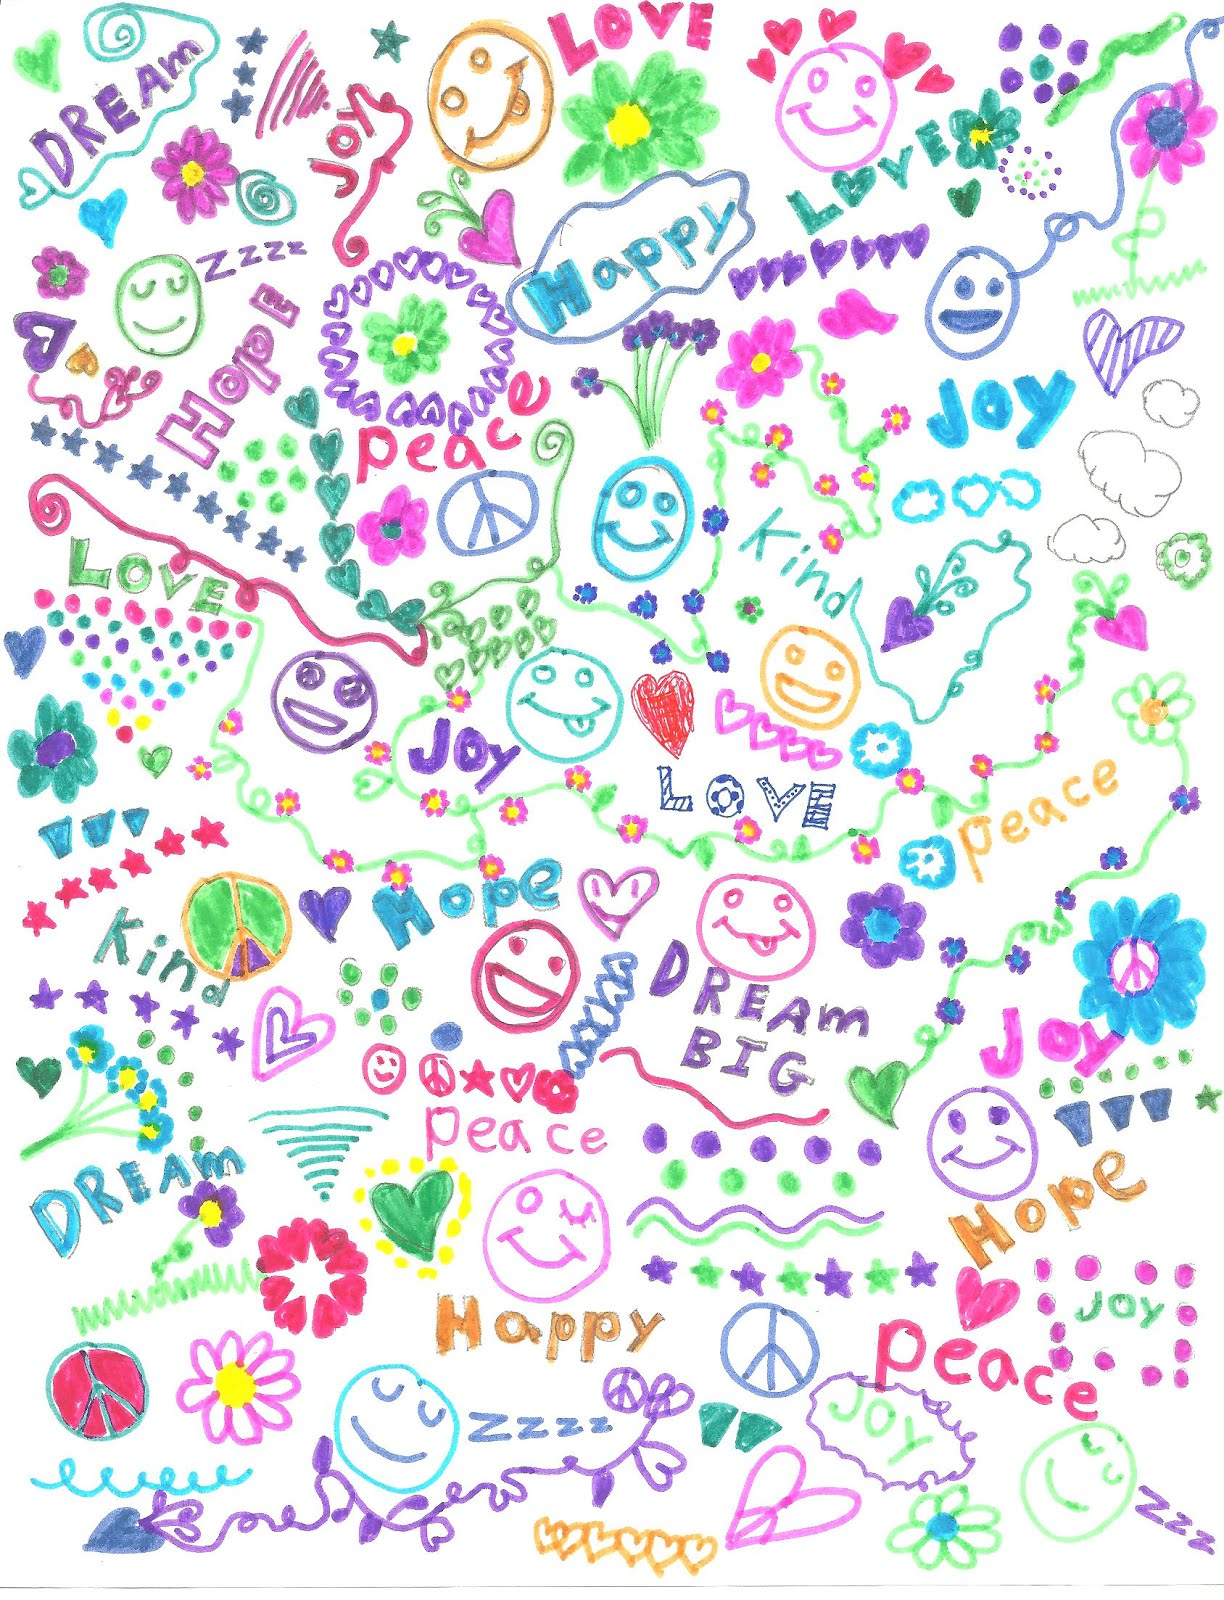 A Happy Page